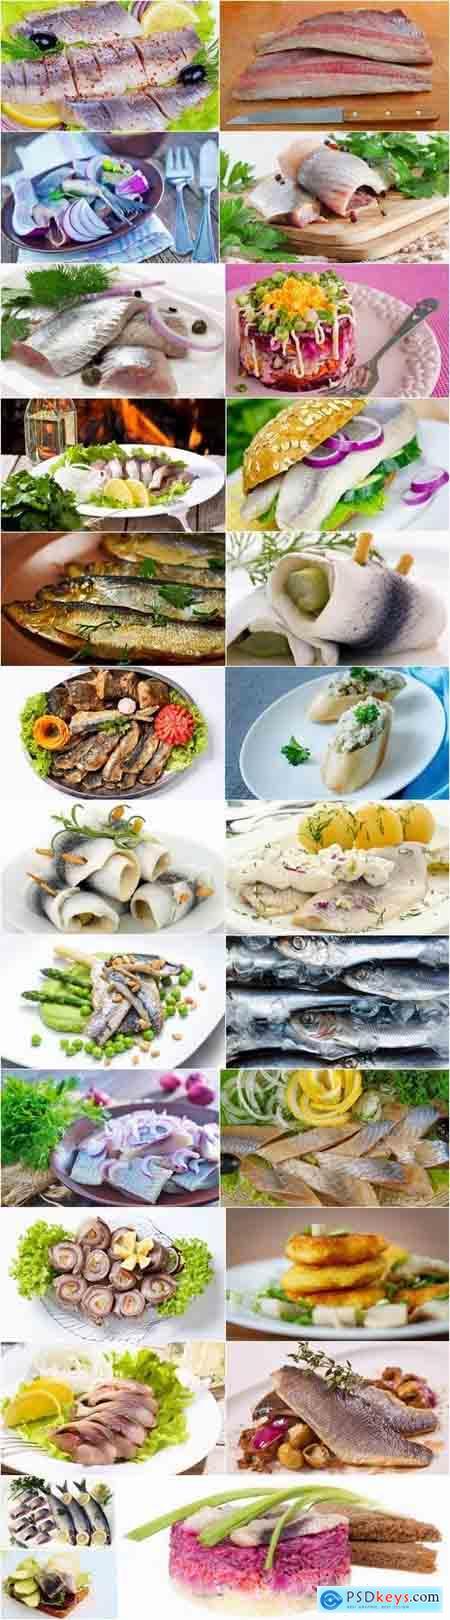 Seafood fish herring dish 25 HQ Jpeg